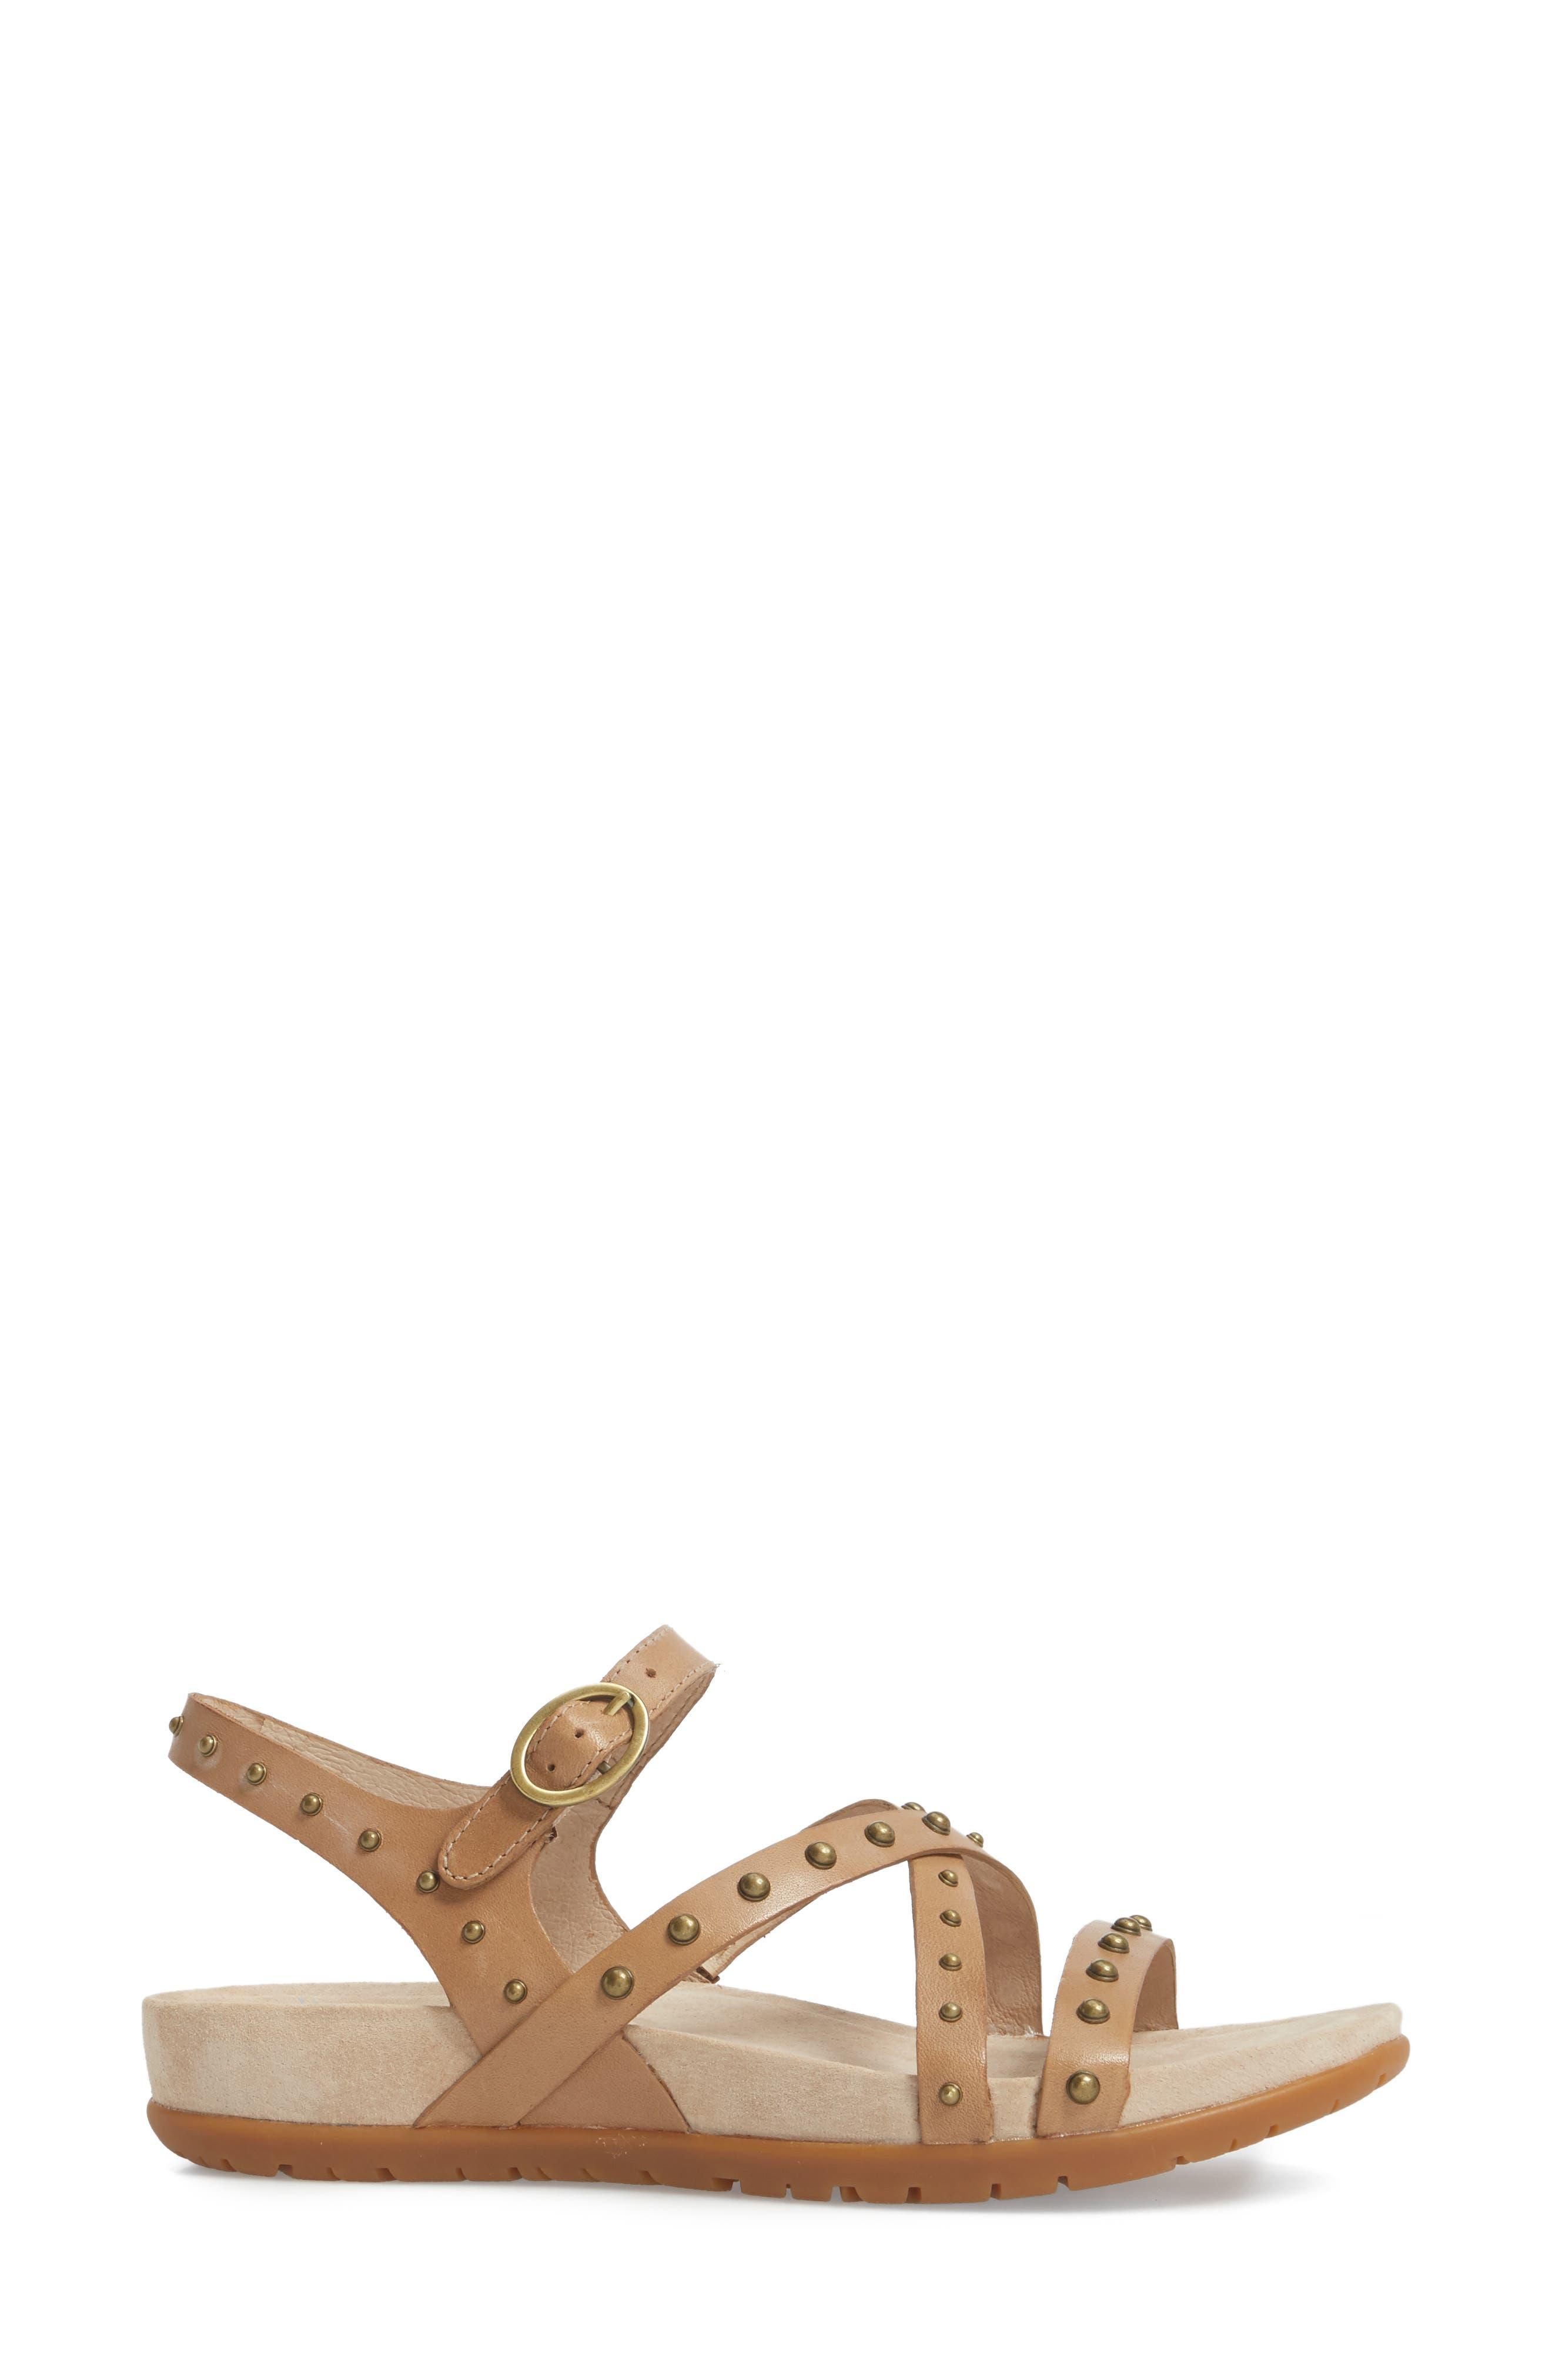 Brigitte Studded Strappy Sandal,                             Alternate thumbnail 3, color,                             Sand Leather